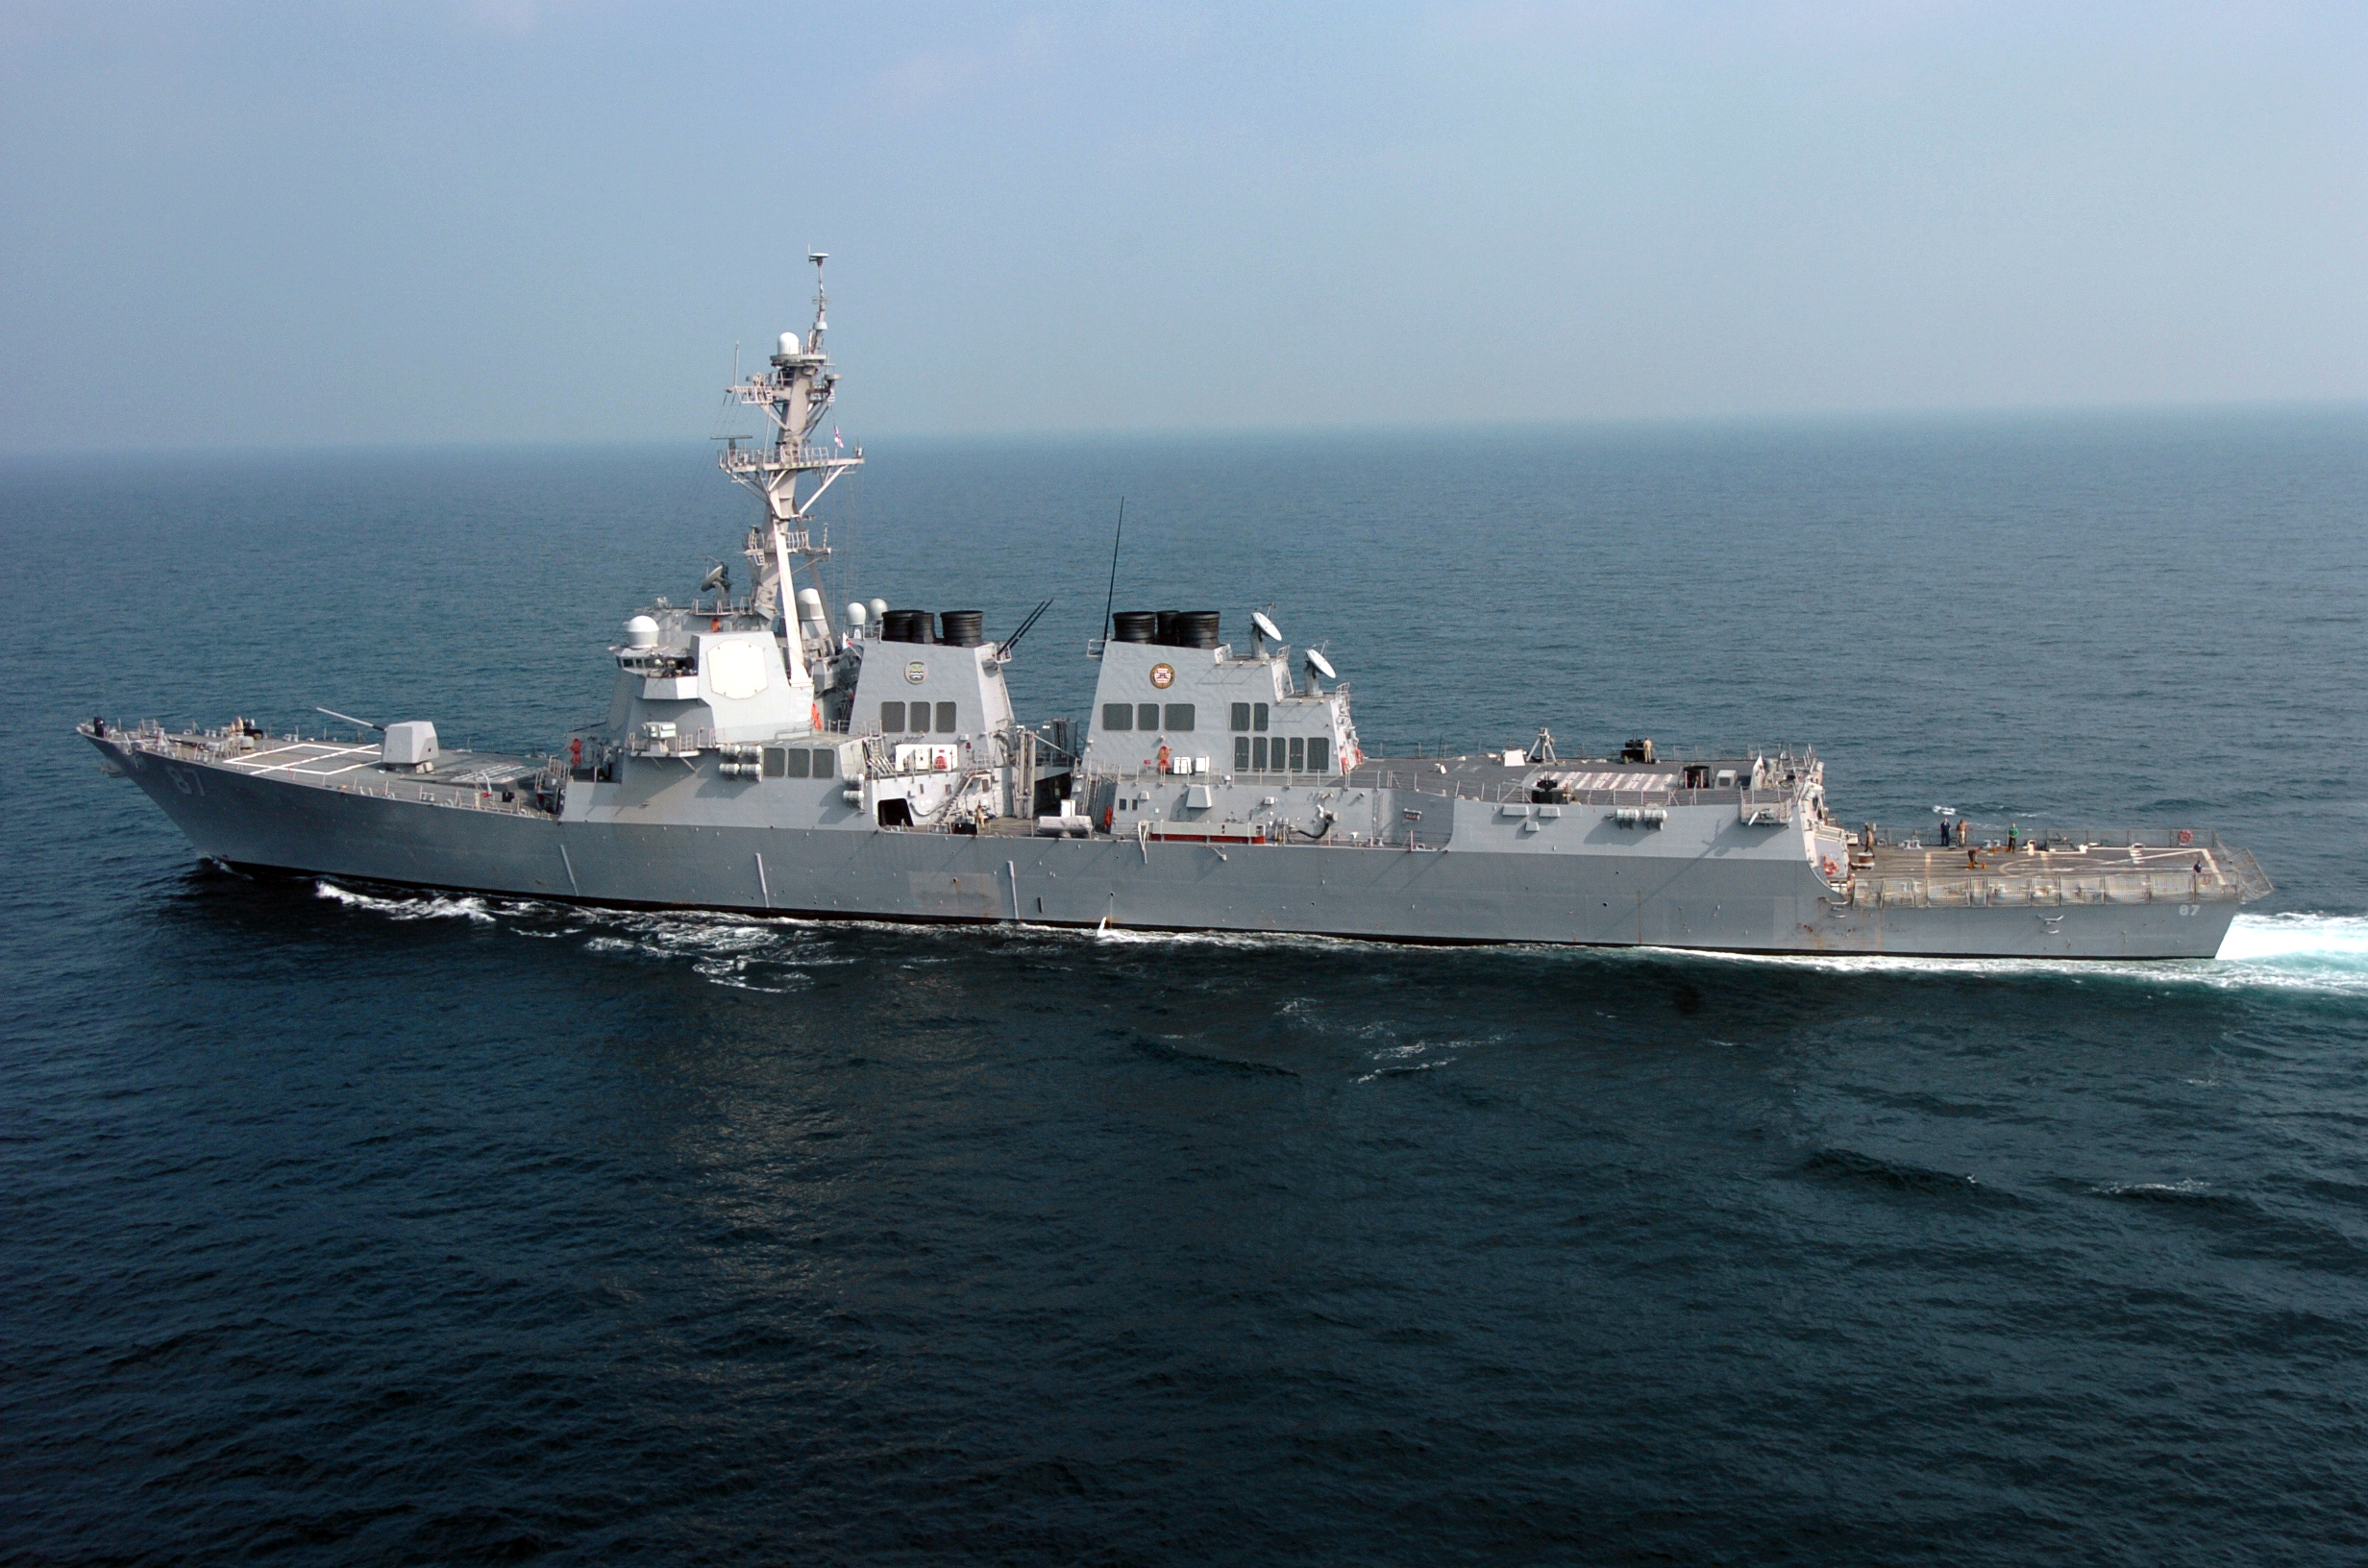 http://en.academic.ru/pictures/enwiki/85/USS_Mason_DDG87.jpg